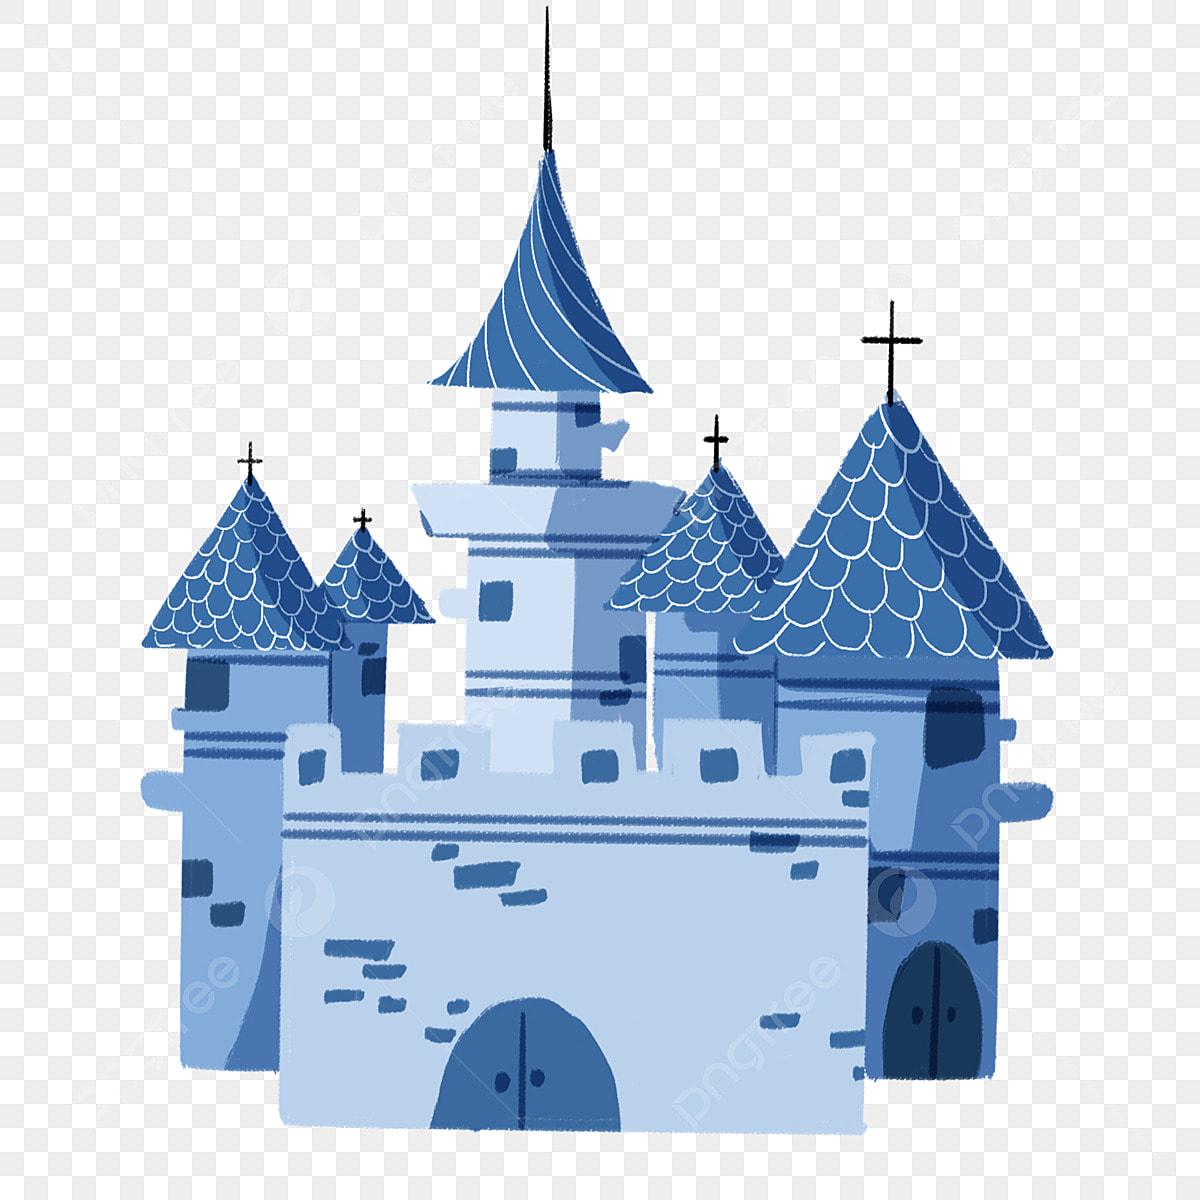 9800 Gambar Rumah Istana Sederhana HD Terbaik